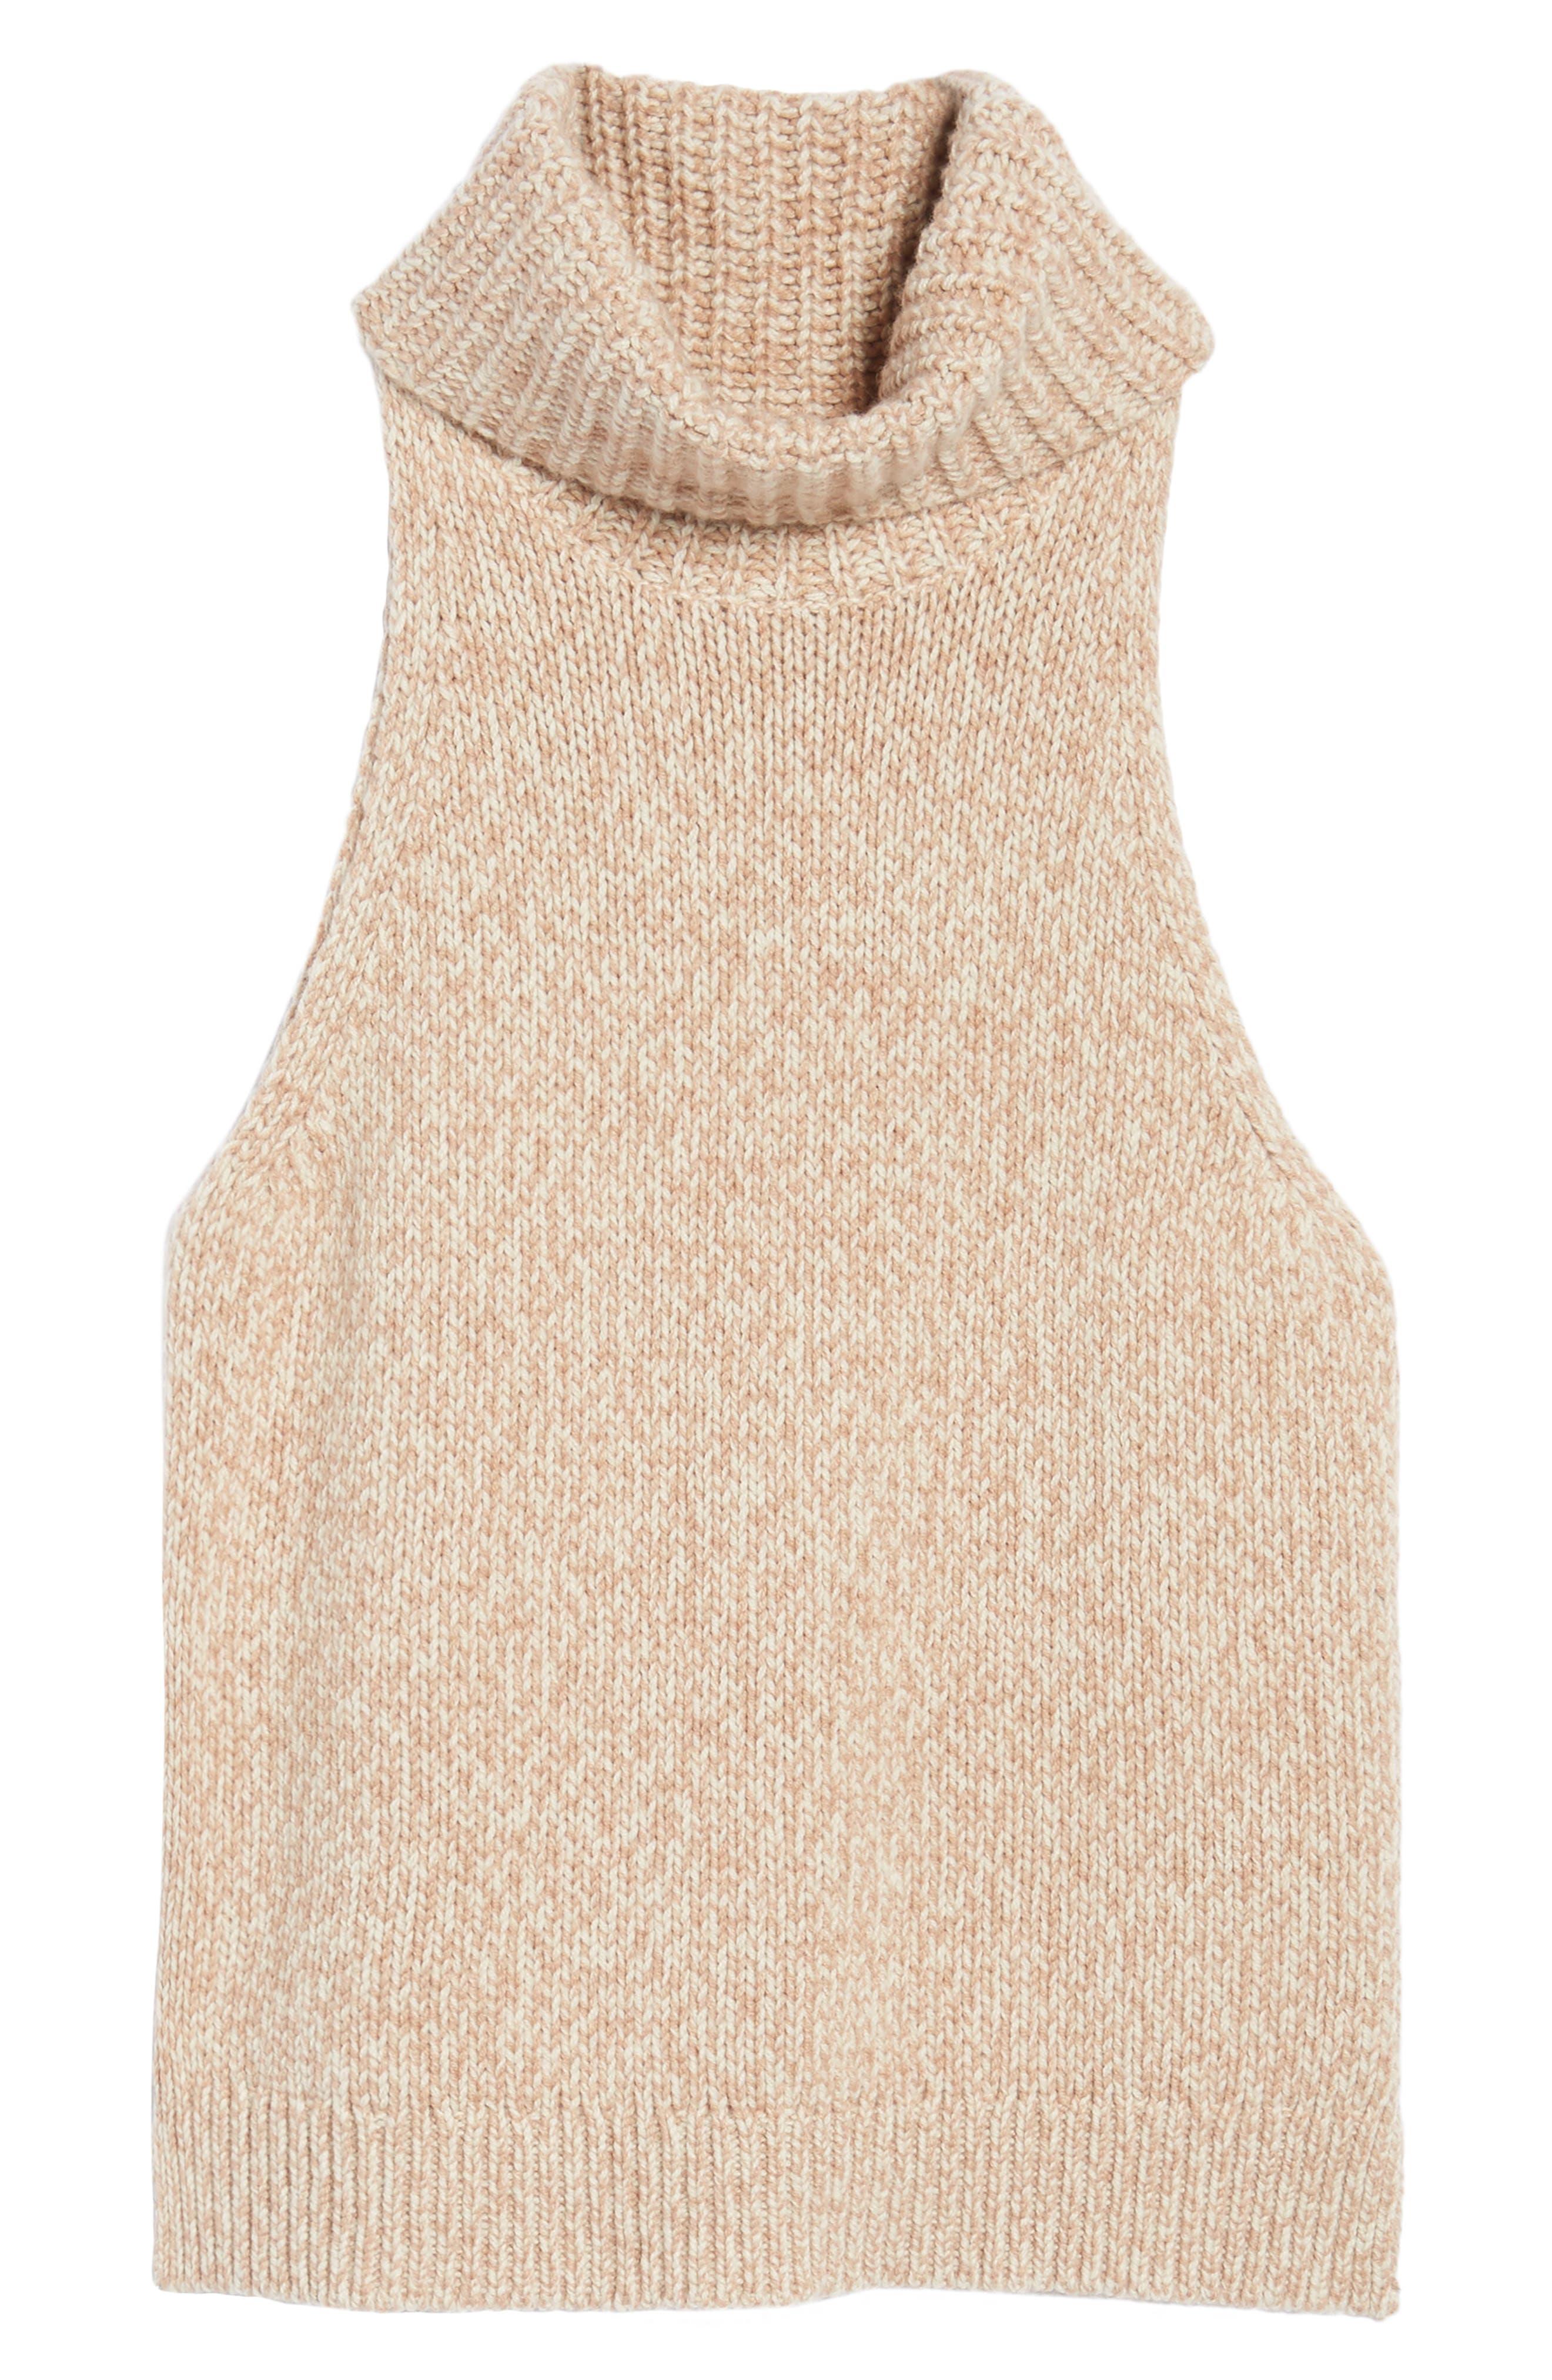 Marled Sleeveless Turtleneck Sweater,                         Main,                         color, Marled Voile